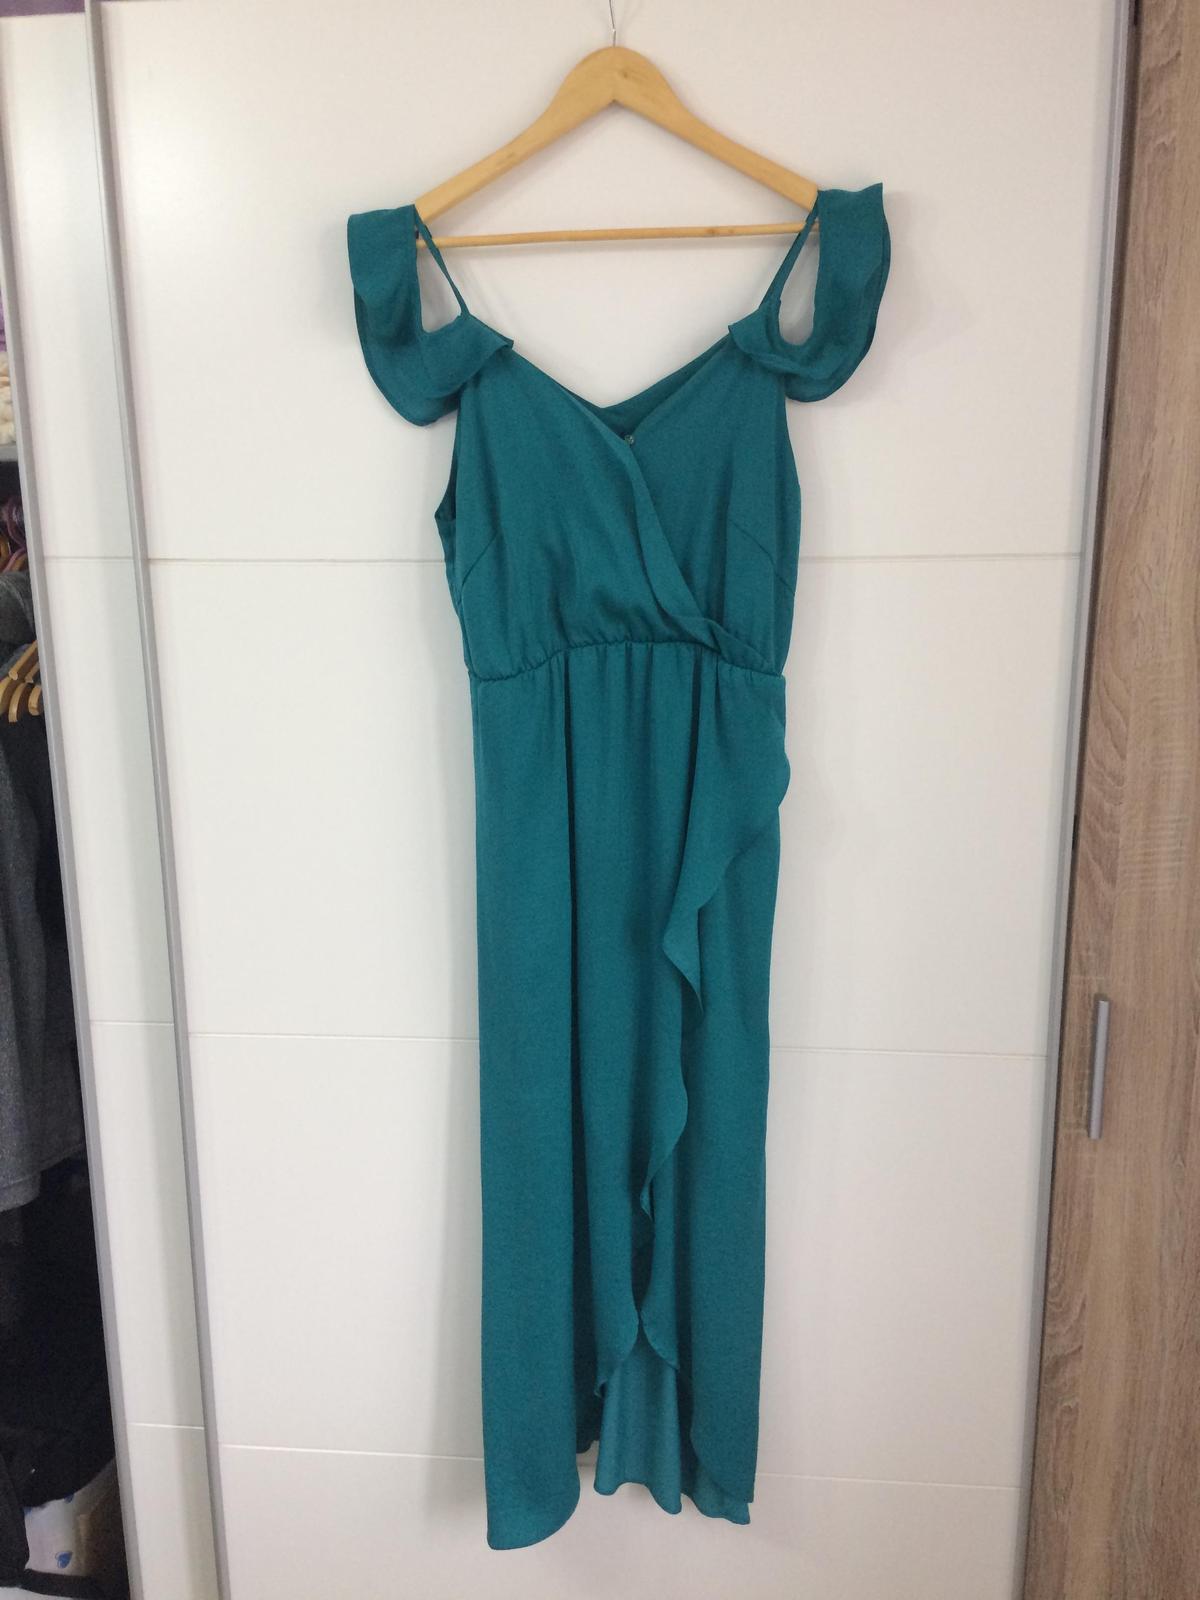 Saténové šaty, tyrkys - Obrázok č. 1